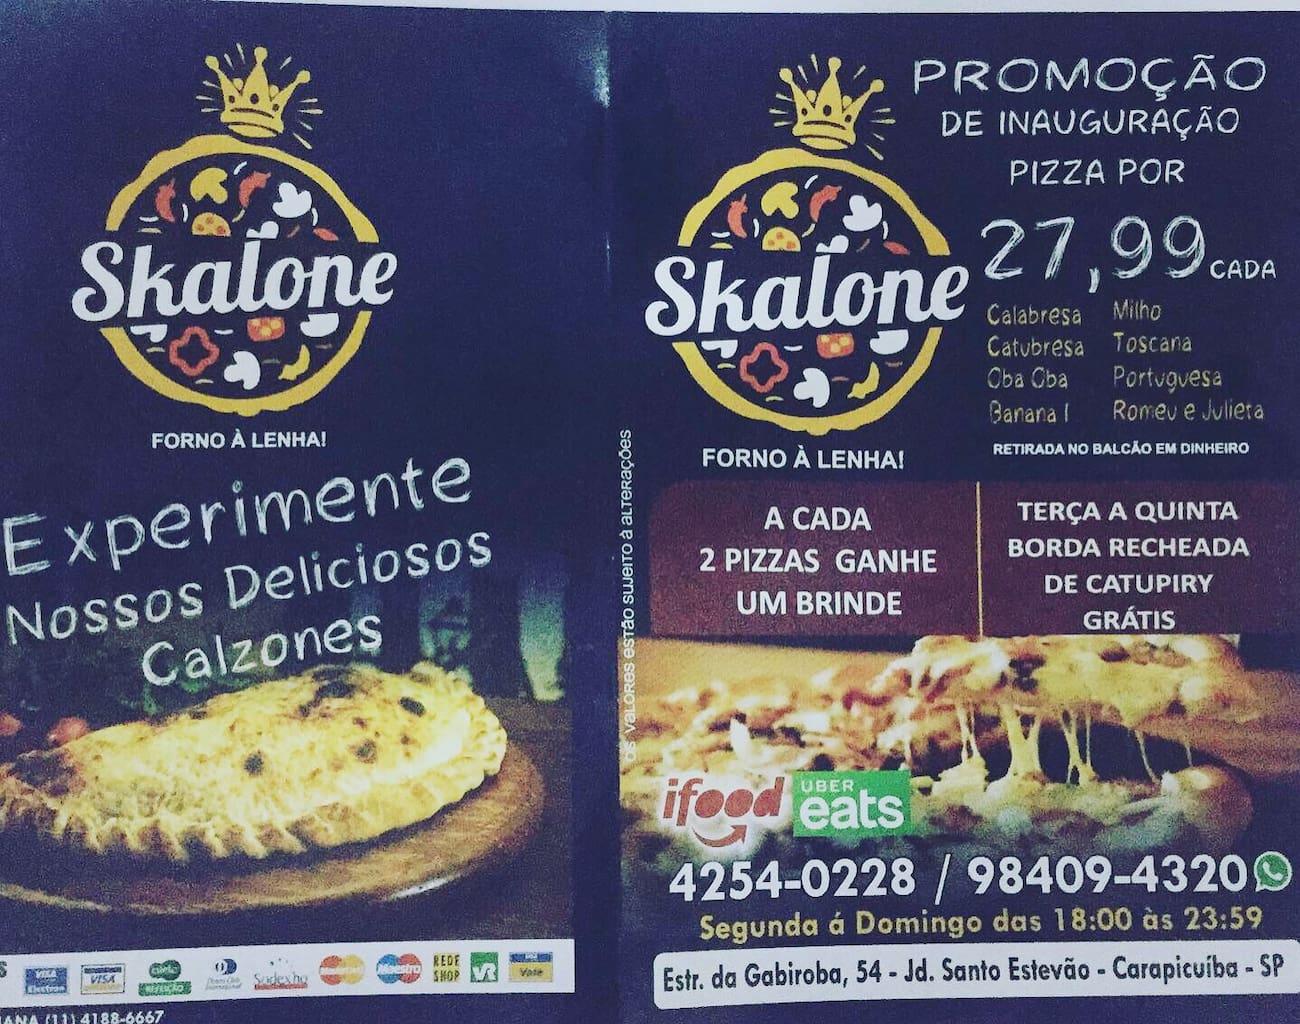 Pizzaria Skalone